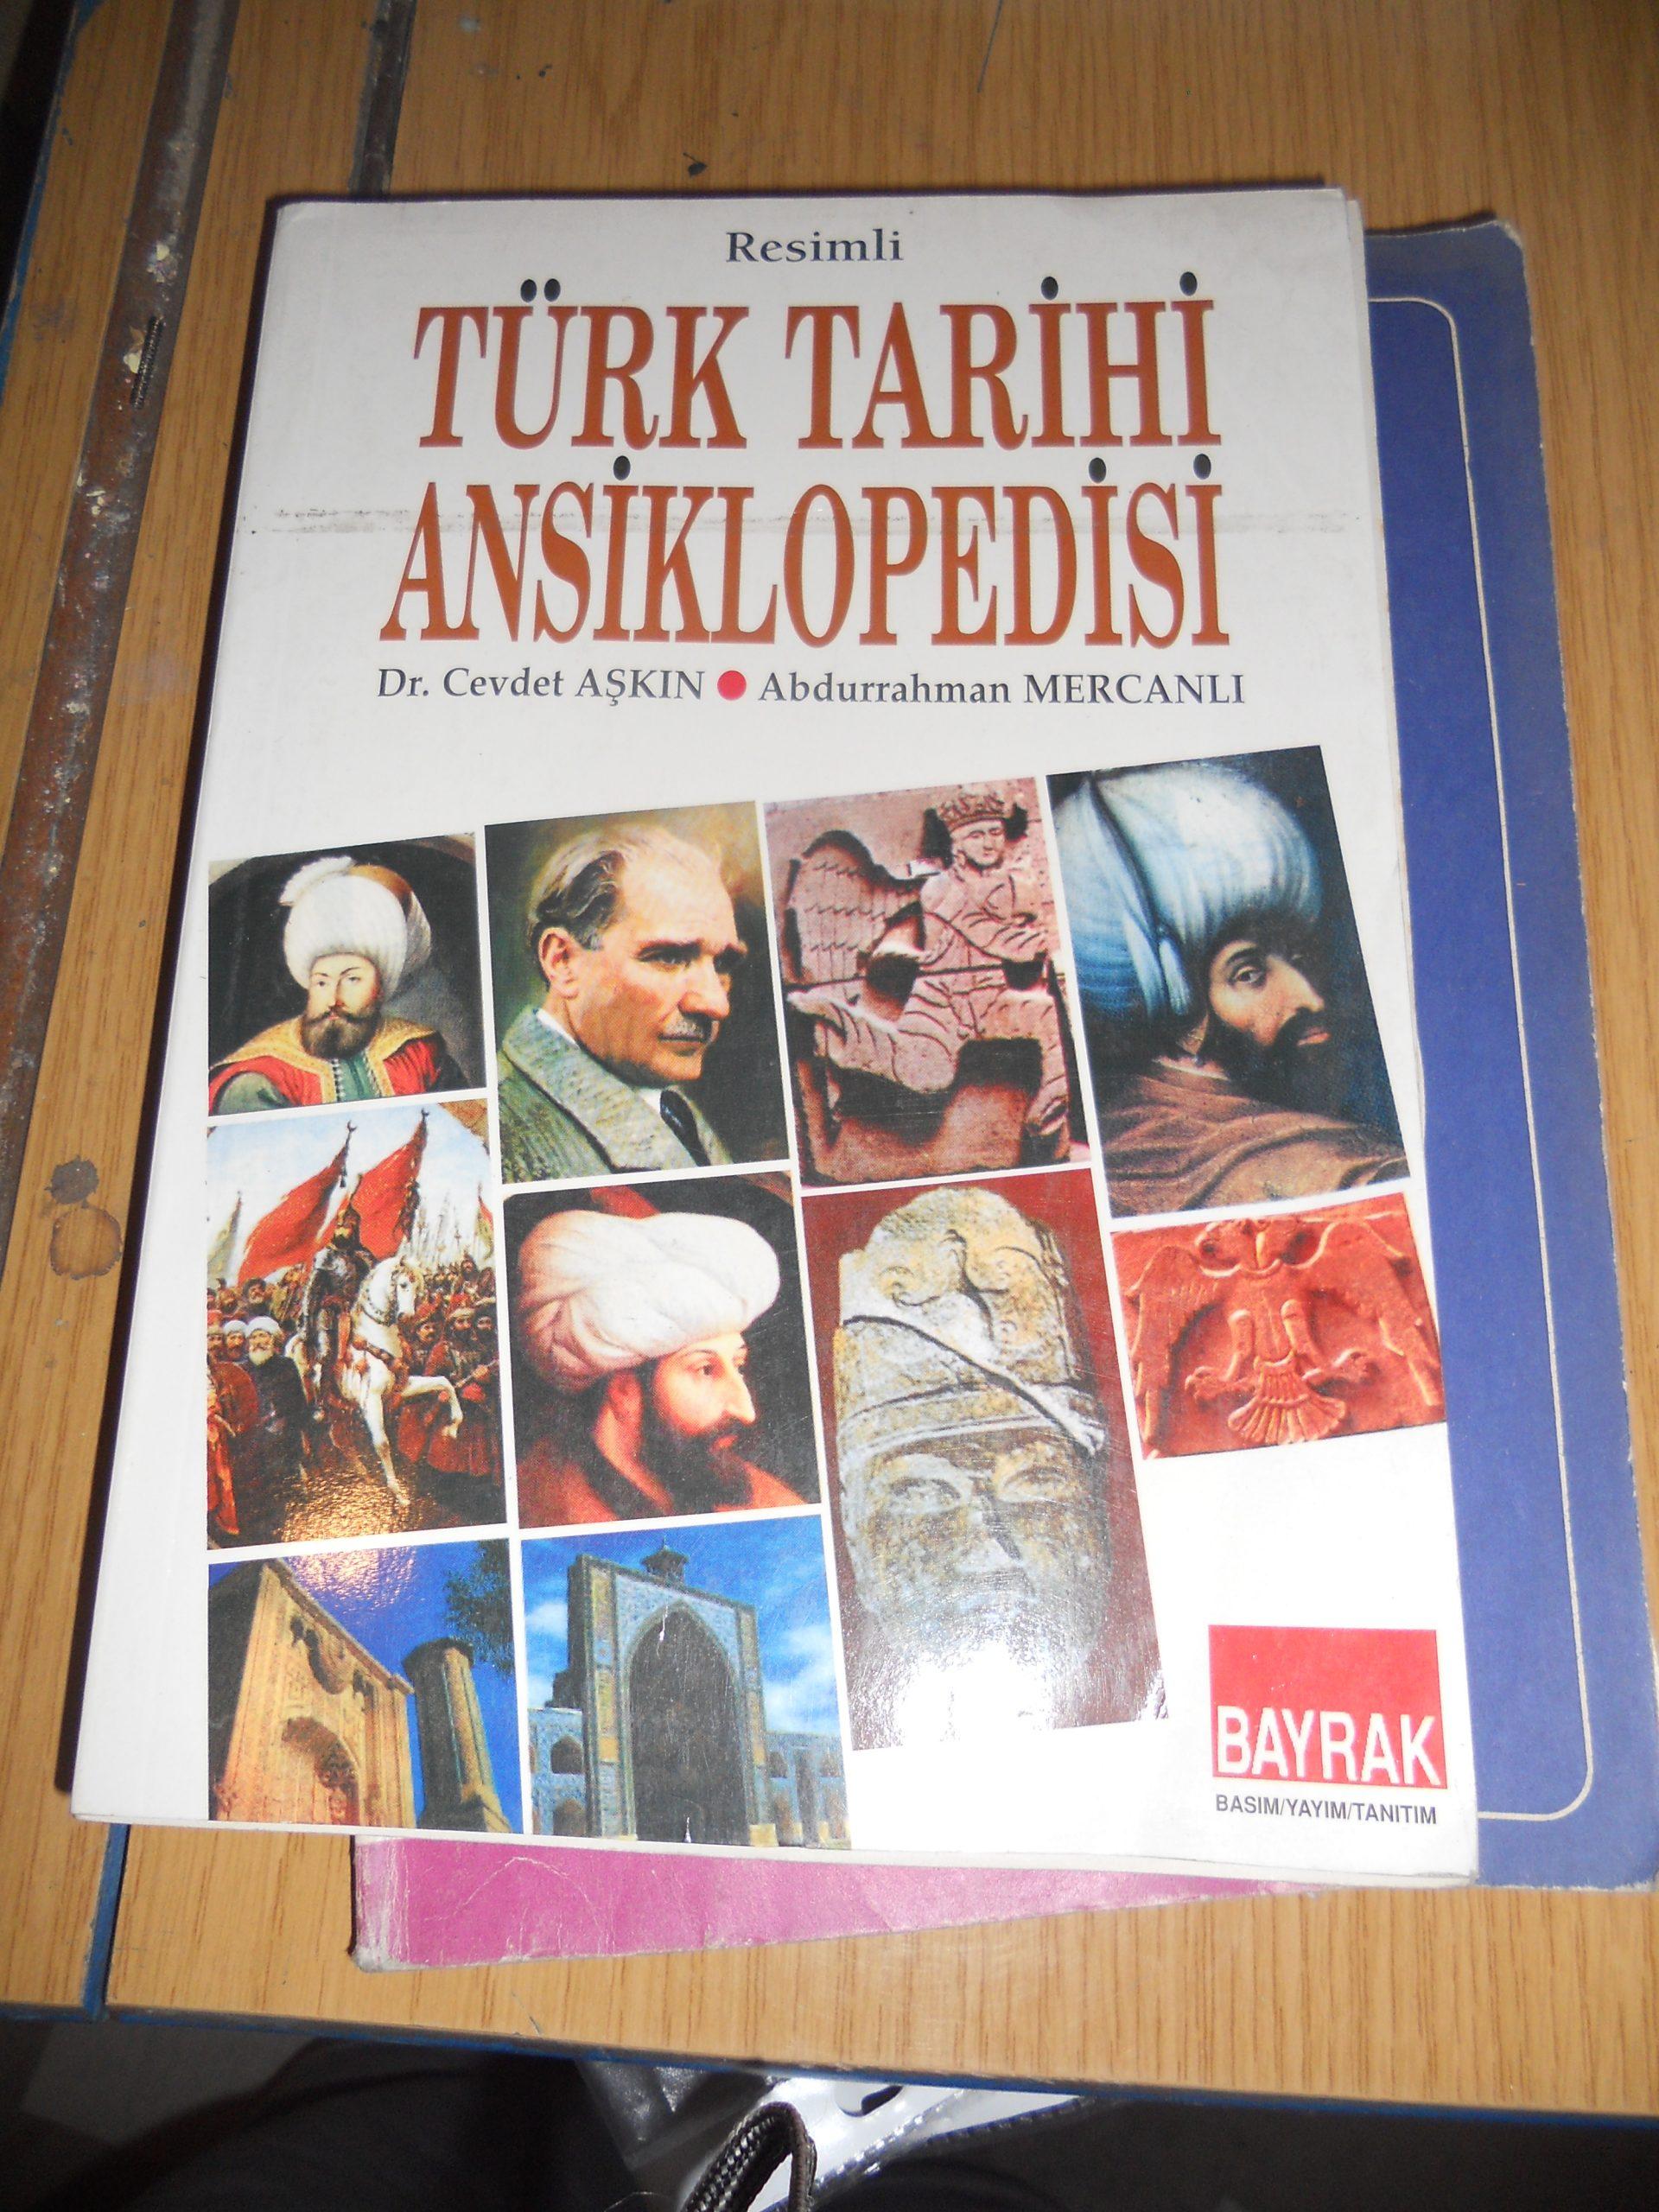 Resimli TÜRK TARİHİ ANSIKLOPEDİSİ/Dr.Cevdet AŞKIN-A.MERCANLI/15 TL